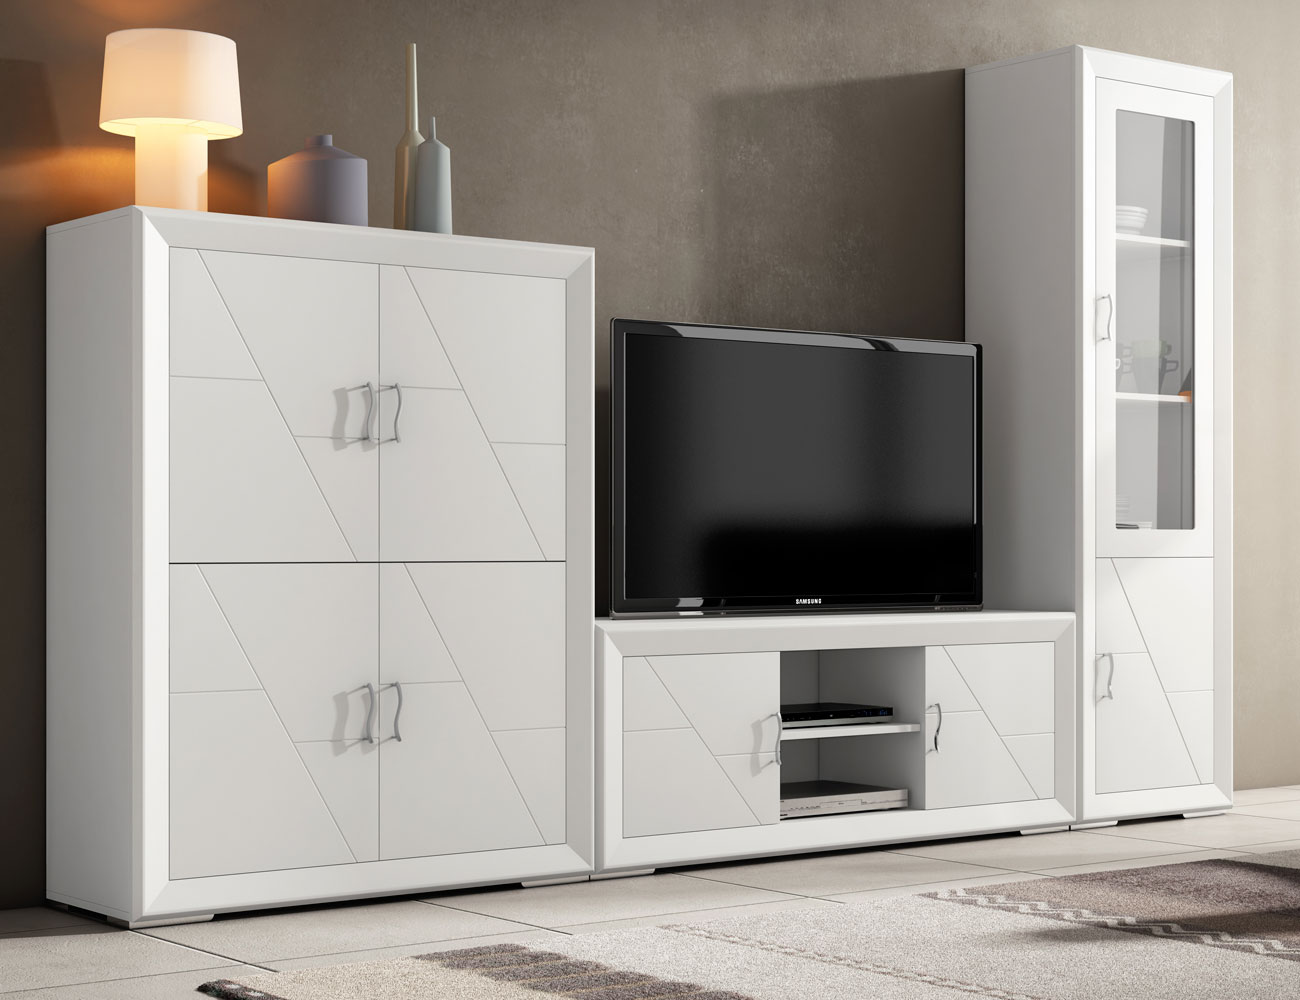 Apilable3 mueble salon comedor blanco madera dm